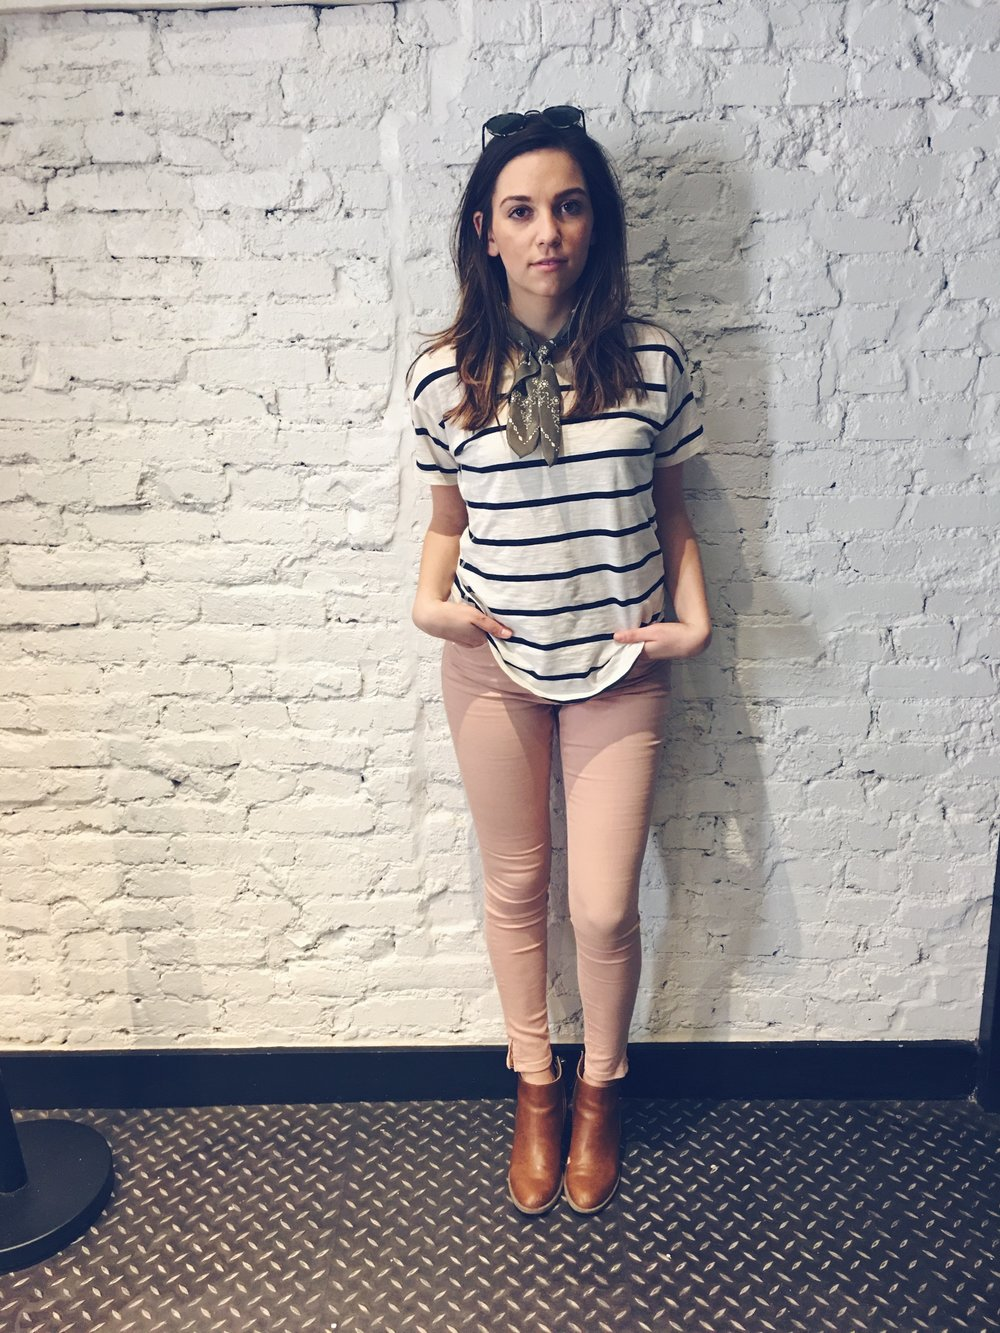 chill millennial girlfriend barbie — honestly, though